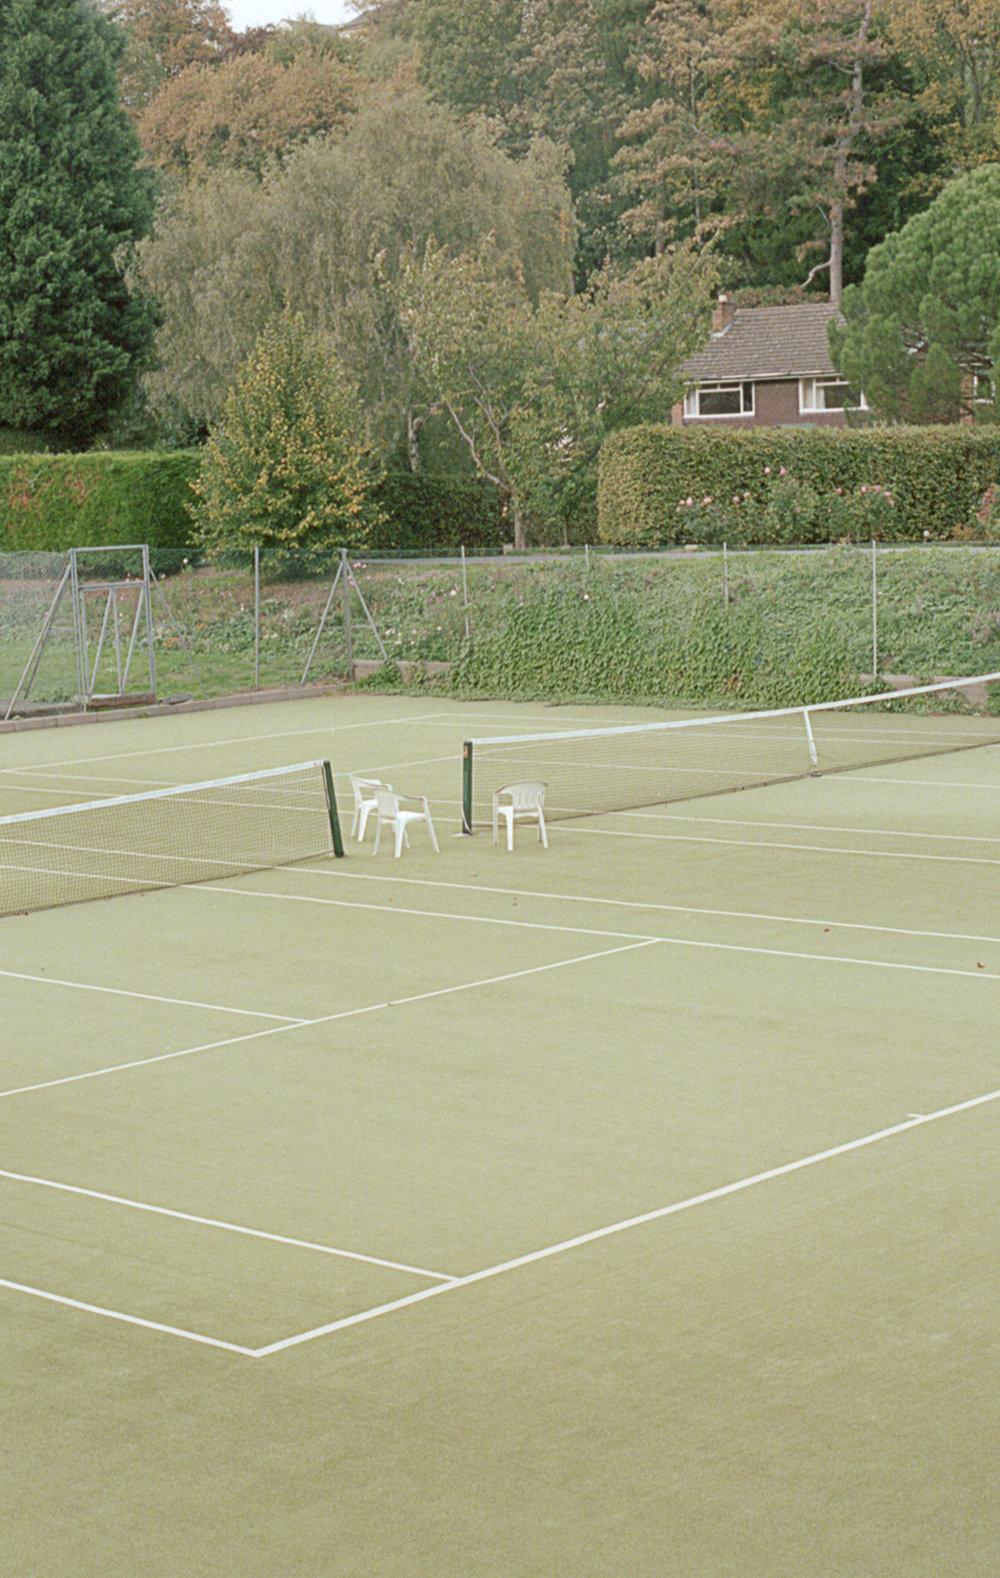 (INSTA) Tennis_35mm_Colour_Roll 4_018.jpg